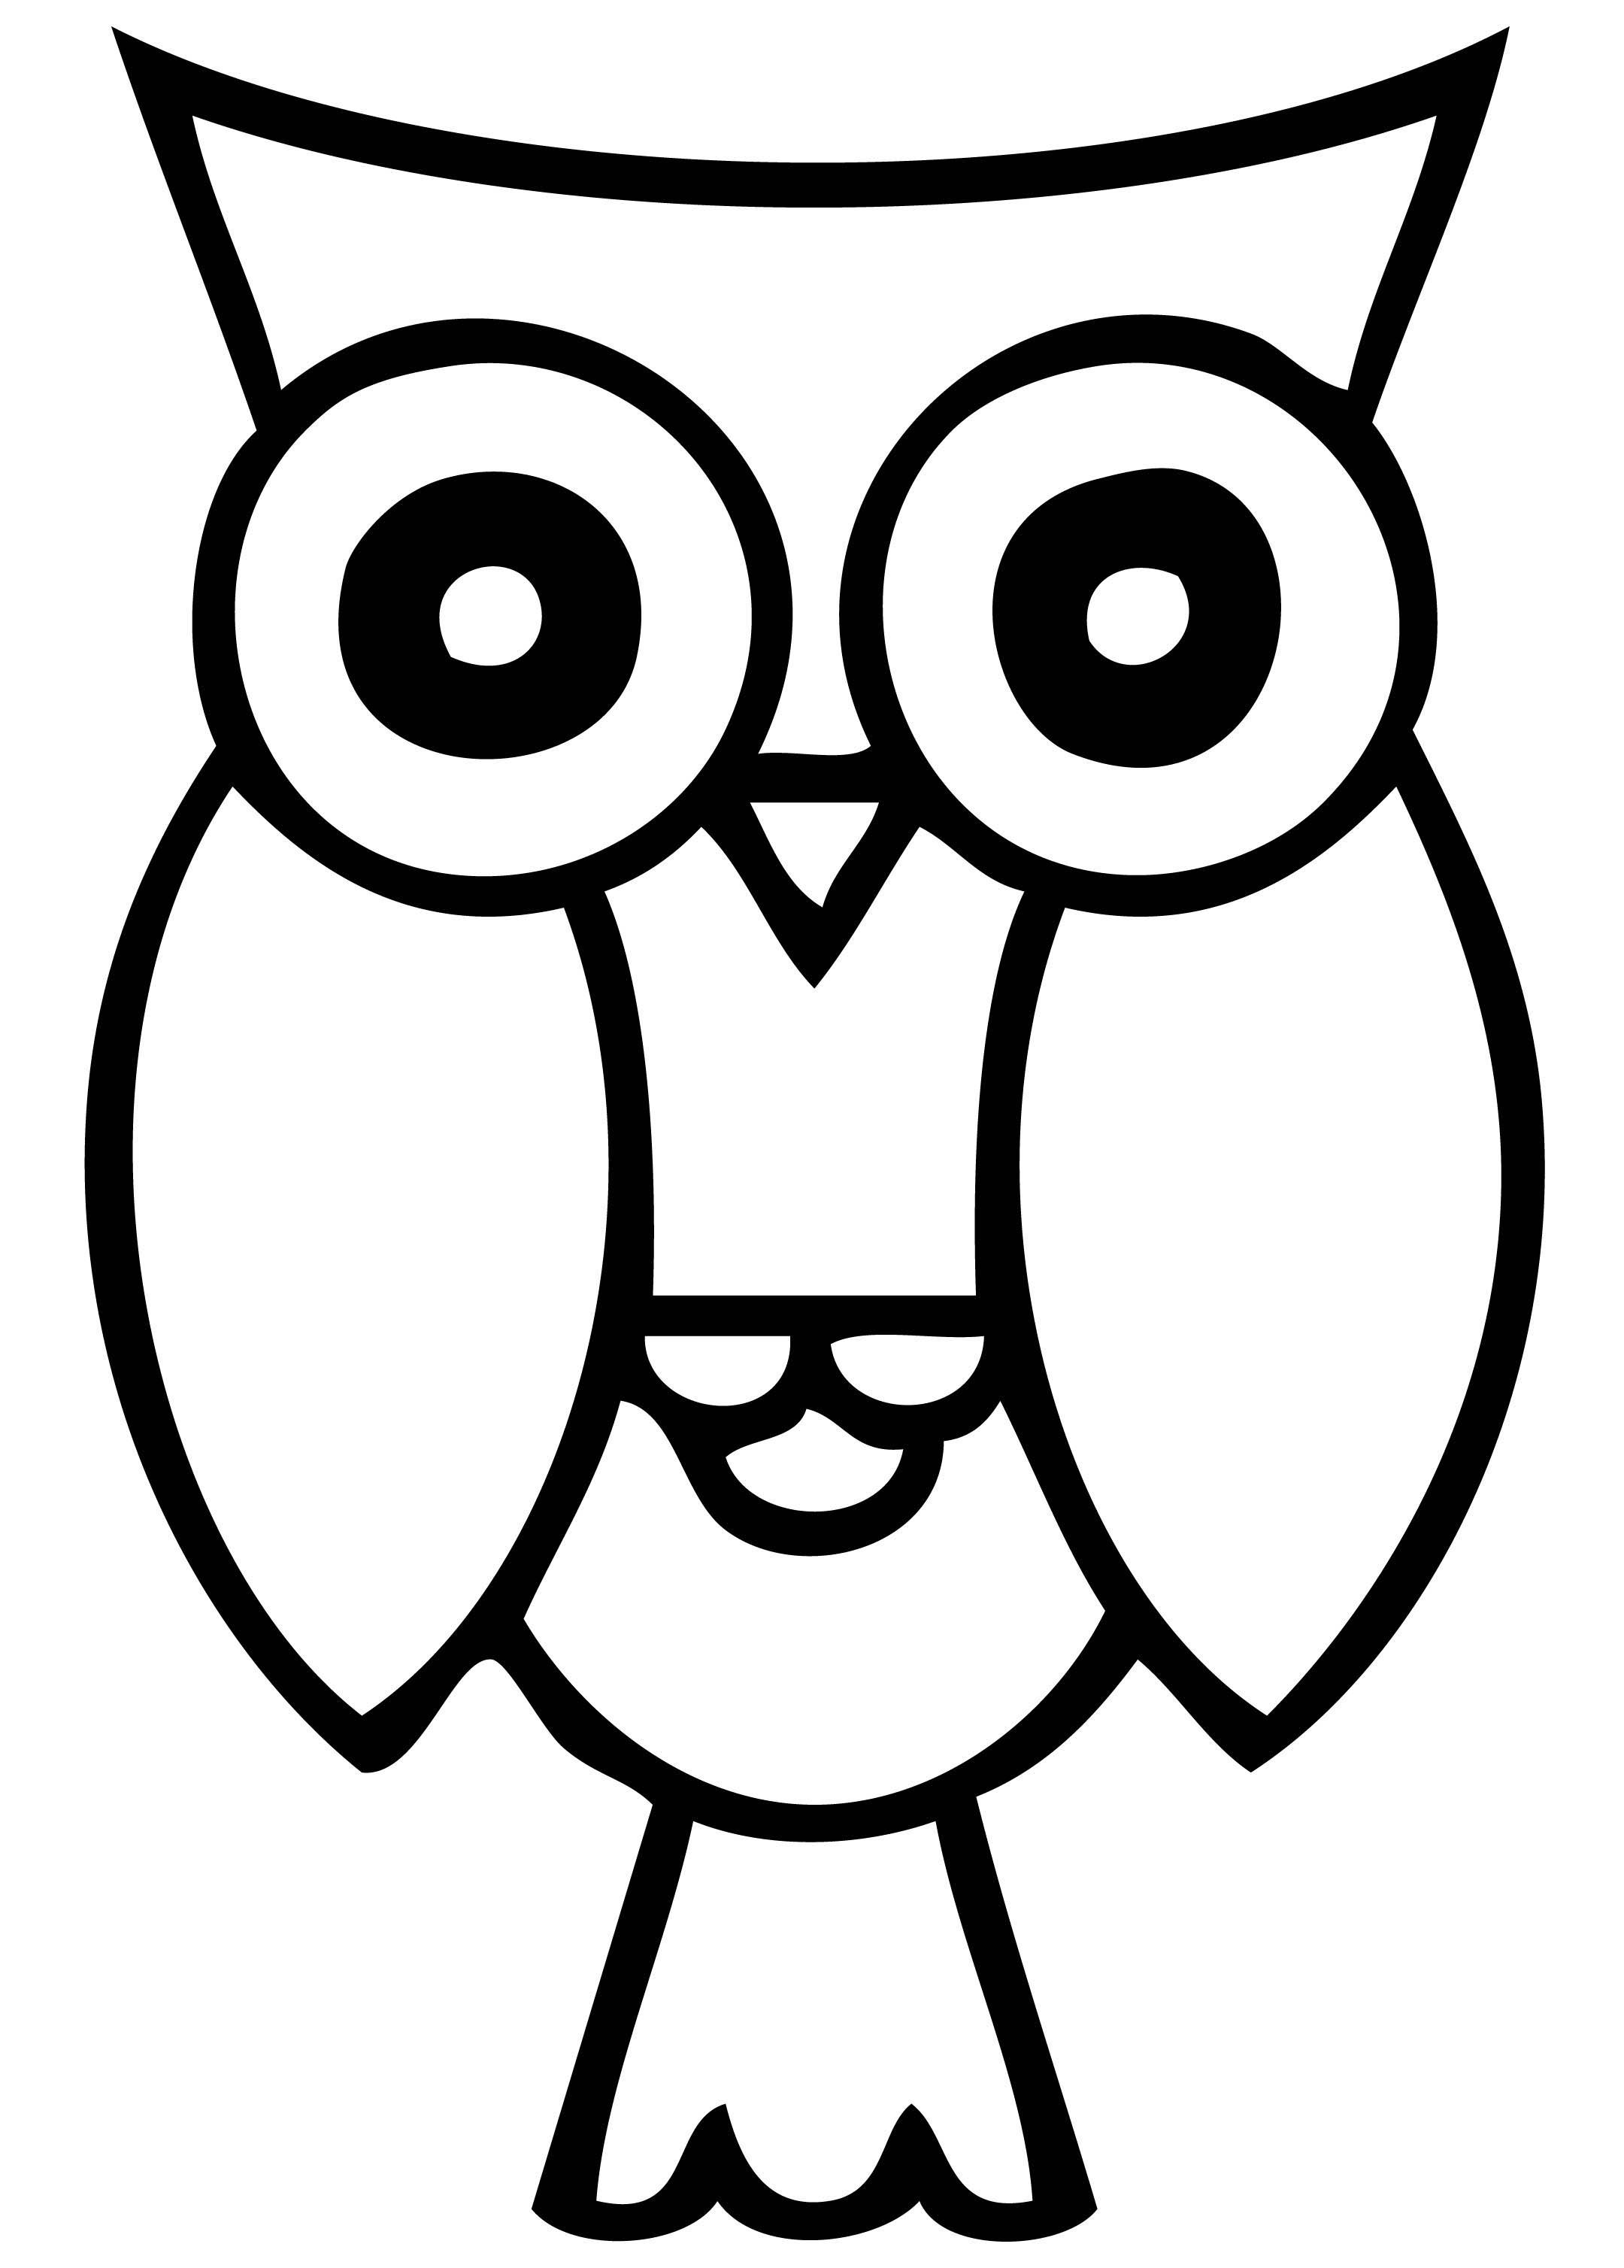 Owl Clip Art Black And White - ClipArt Best (2160 x 3016 Pixel)